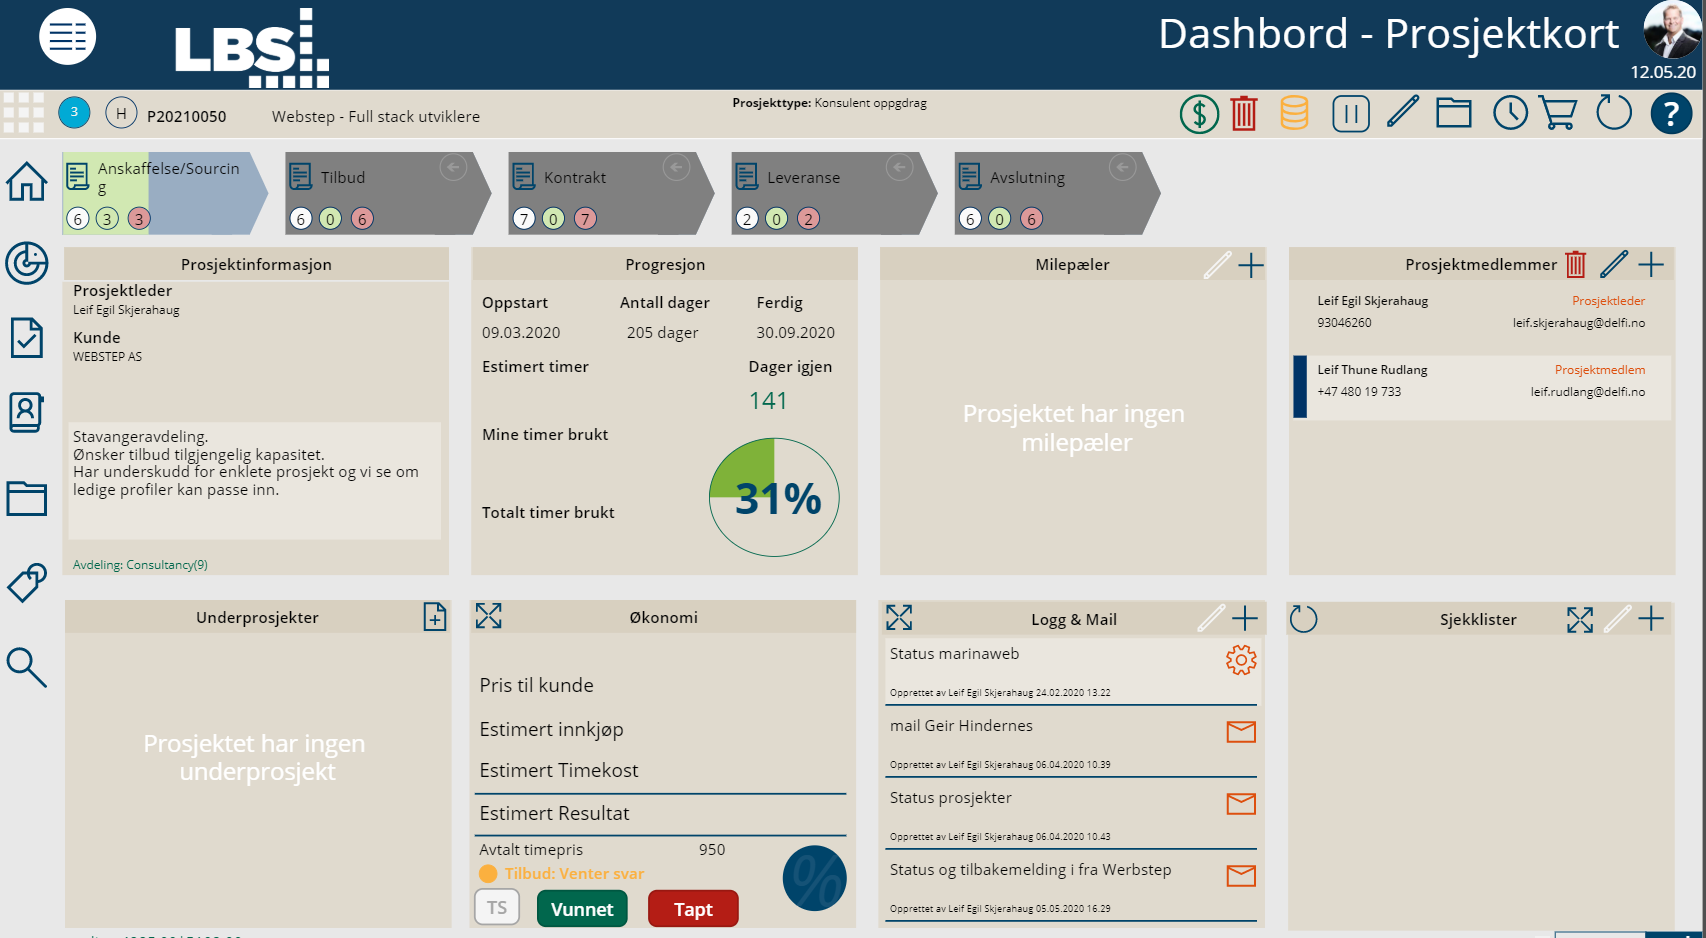 Prosjektdashboard for kontroll og oppfølging